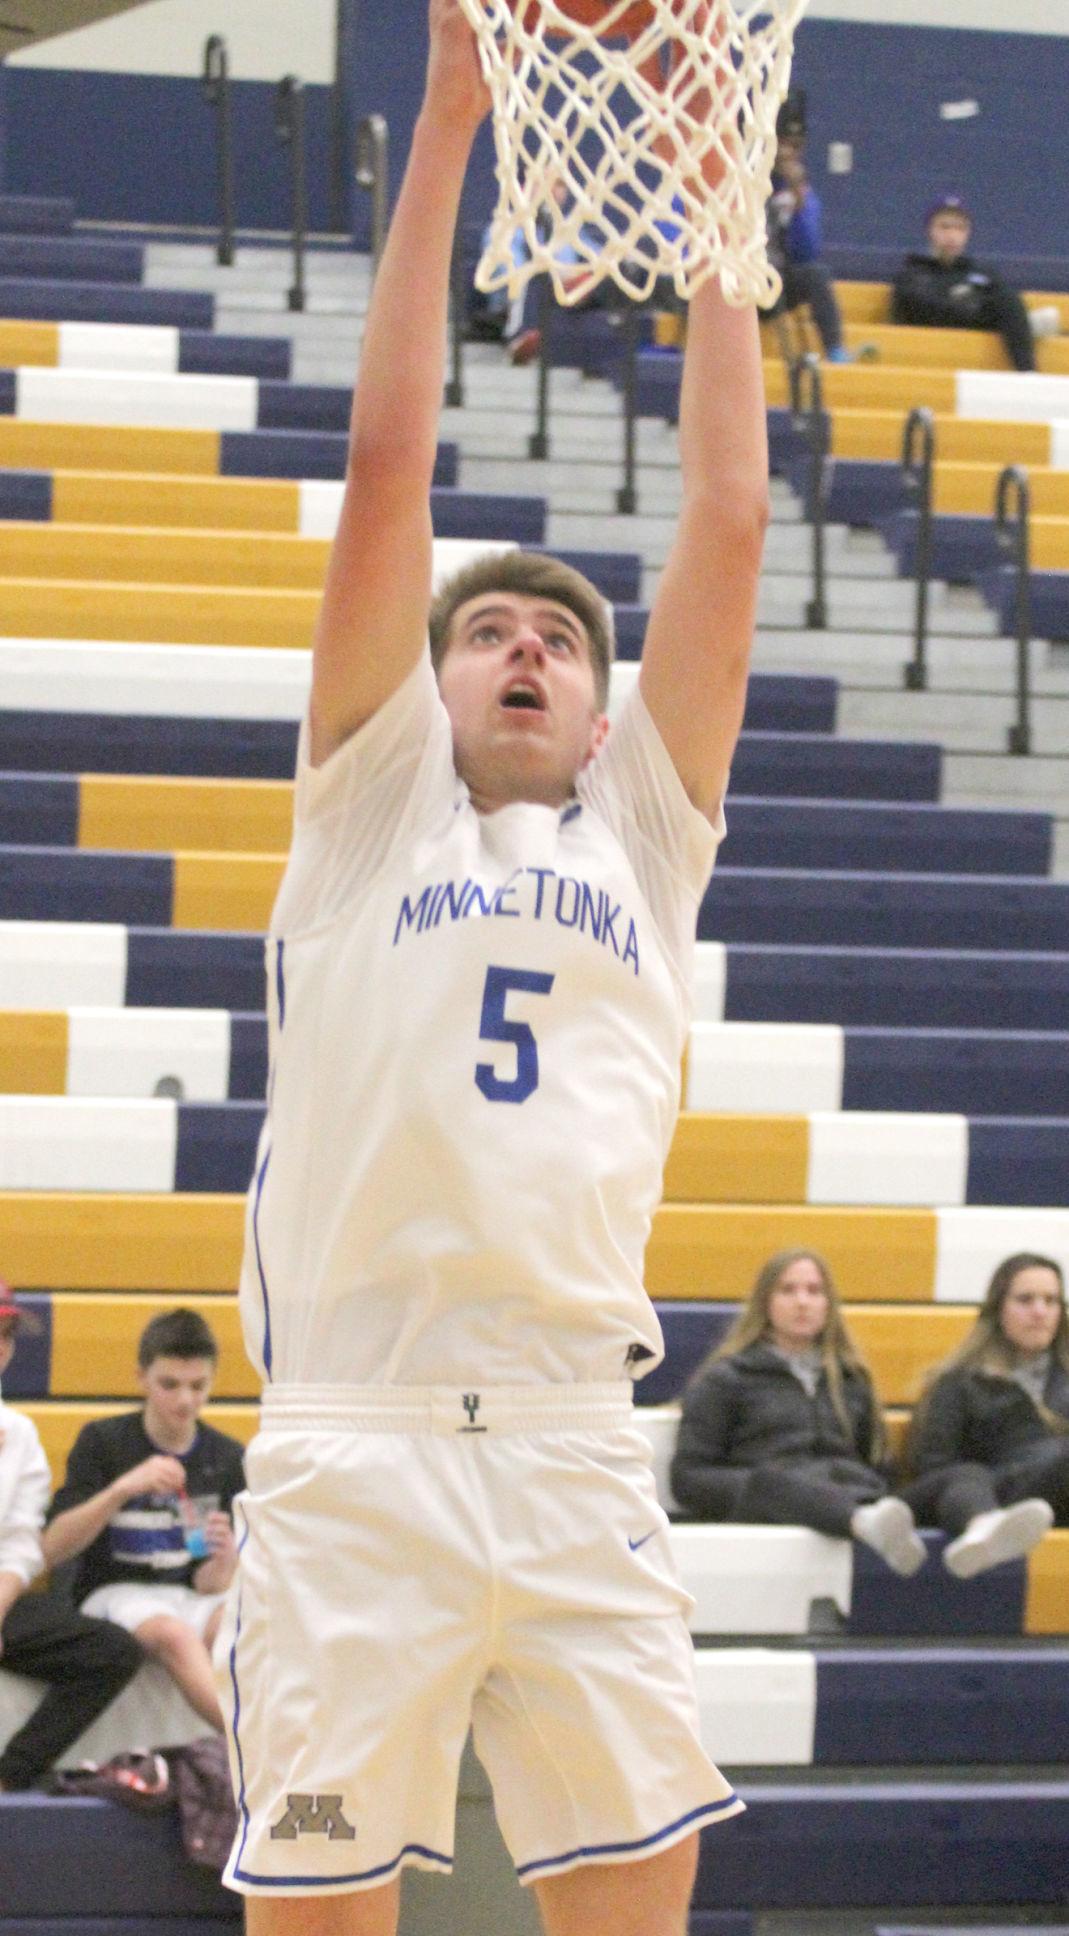 Tonka Basketball - Steele